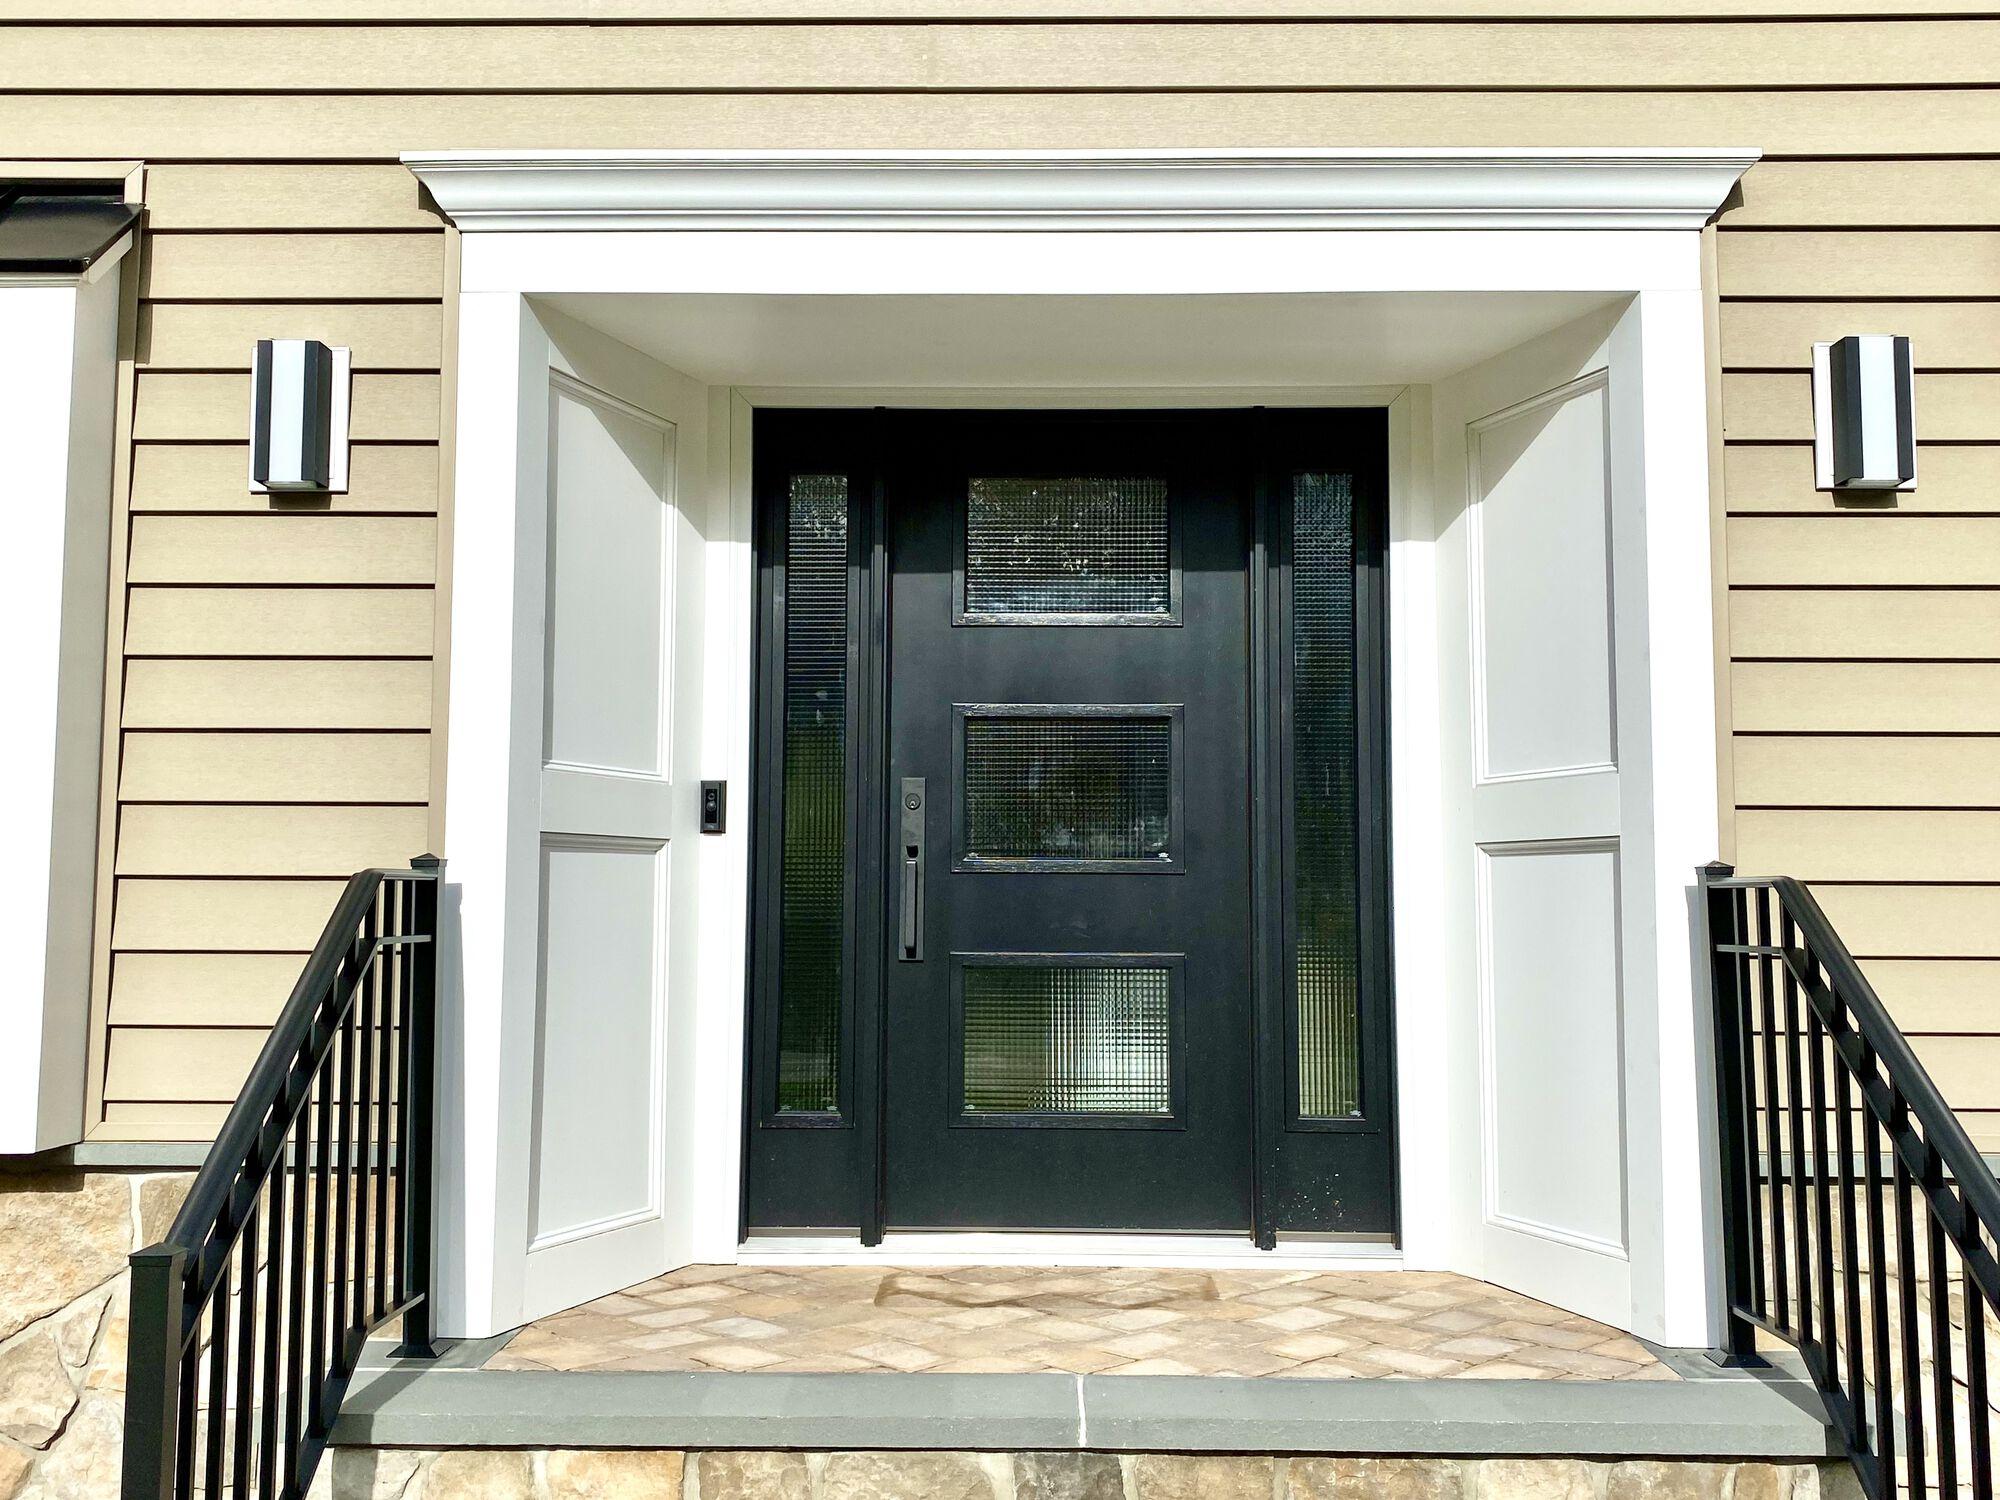 Azek Trim and Recessed Panels, Alside Windows, Therma-Tru Entry Door in Randolph, Morris County NJ